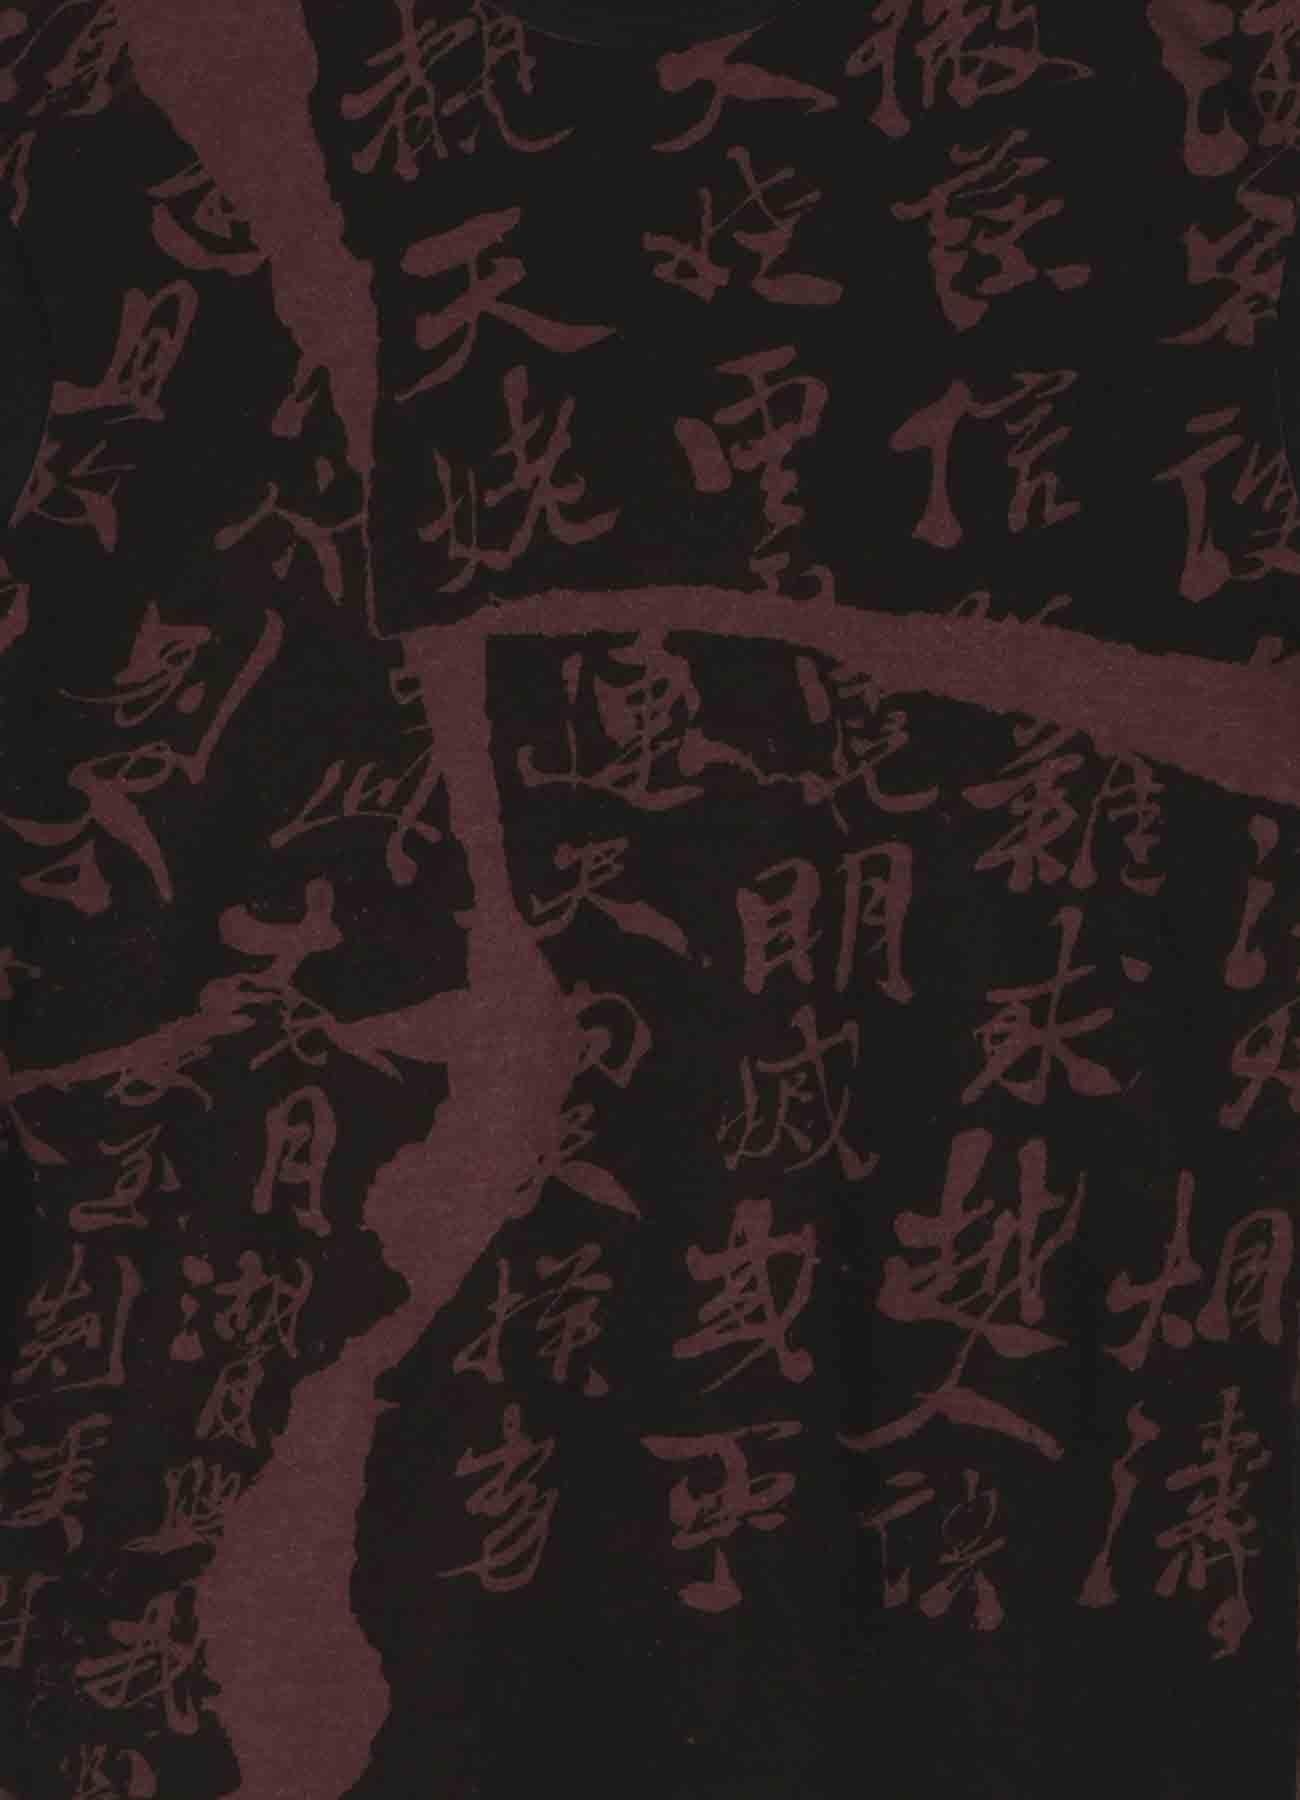 YARN DYE 16/- KANJI PRINT LONG SLEEVES